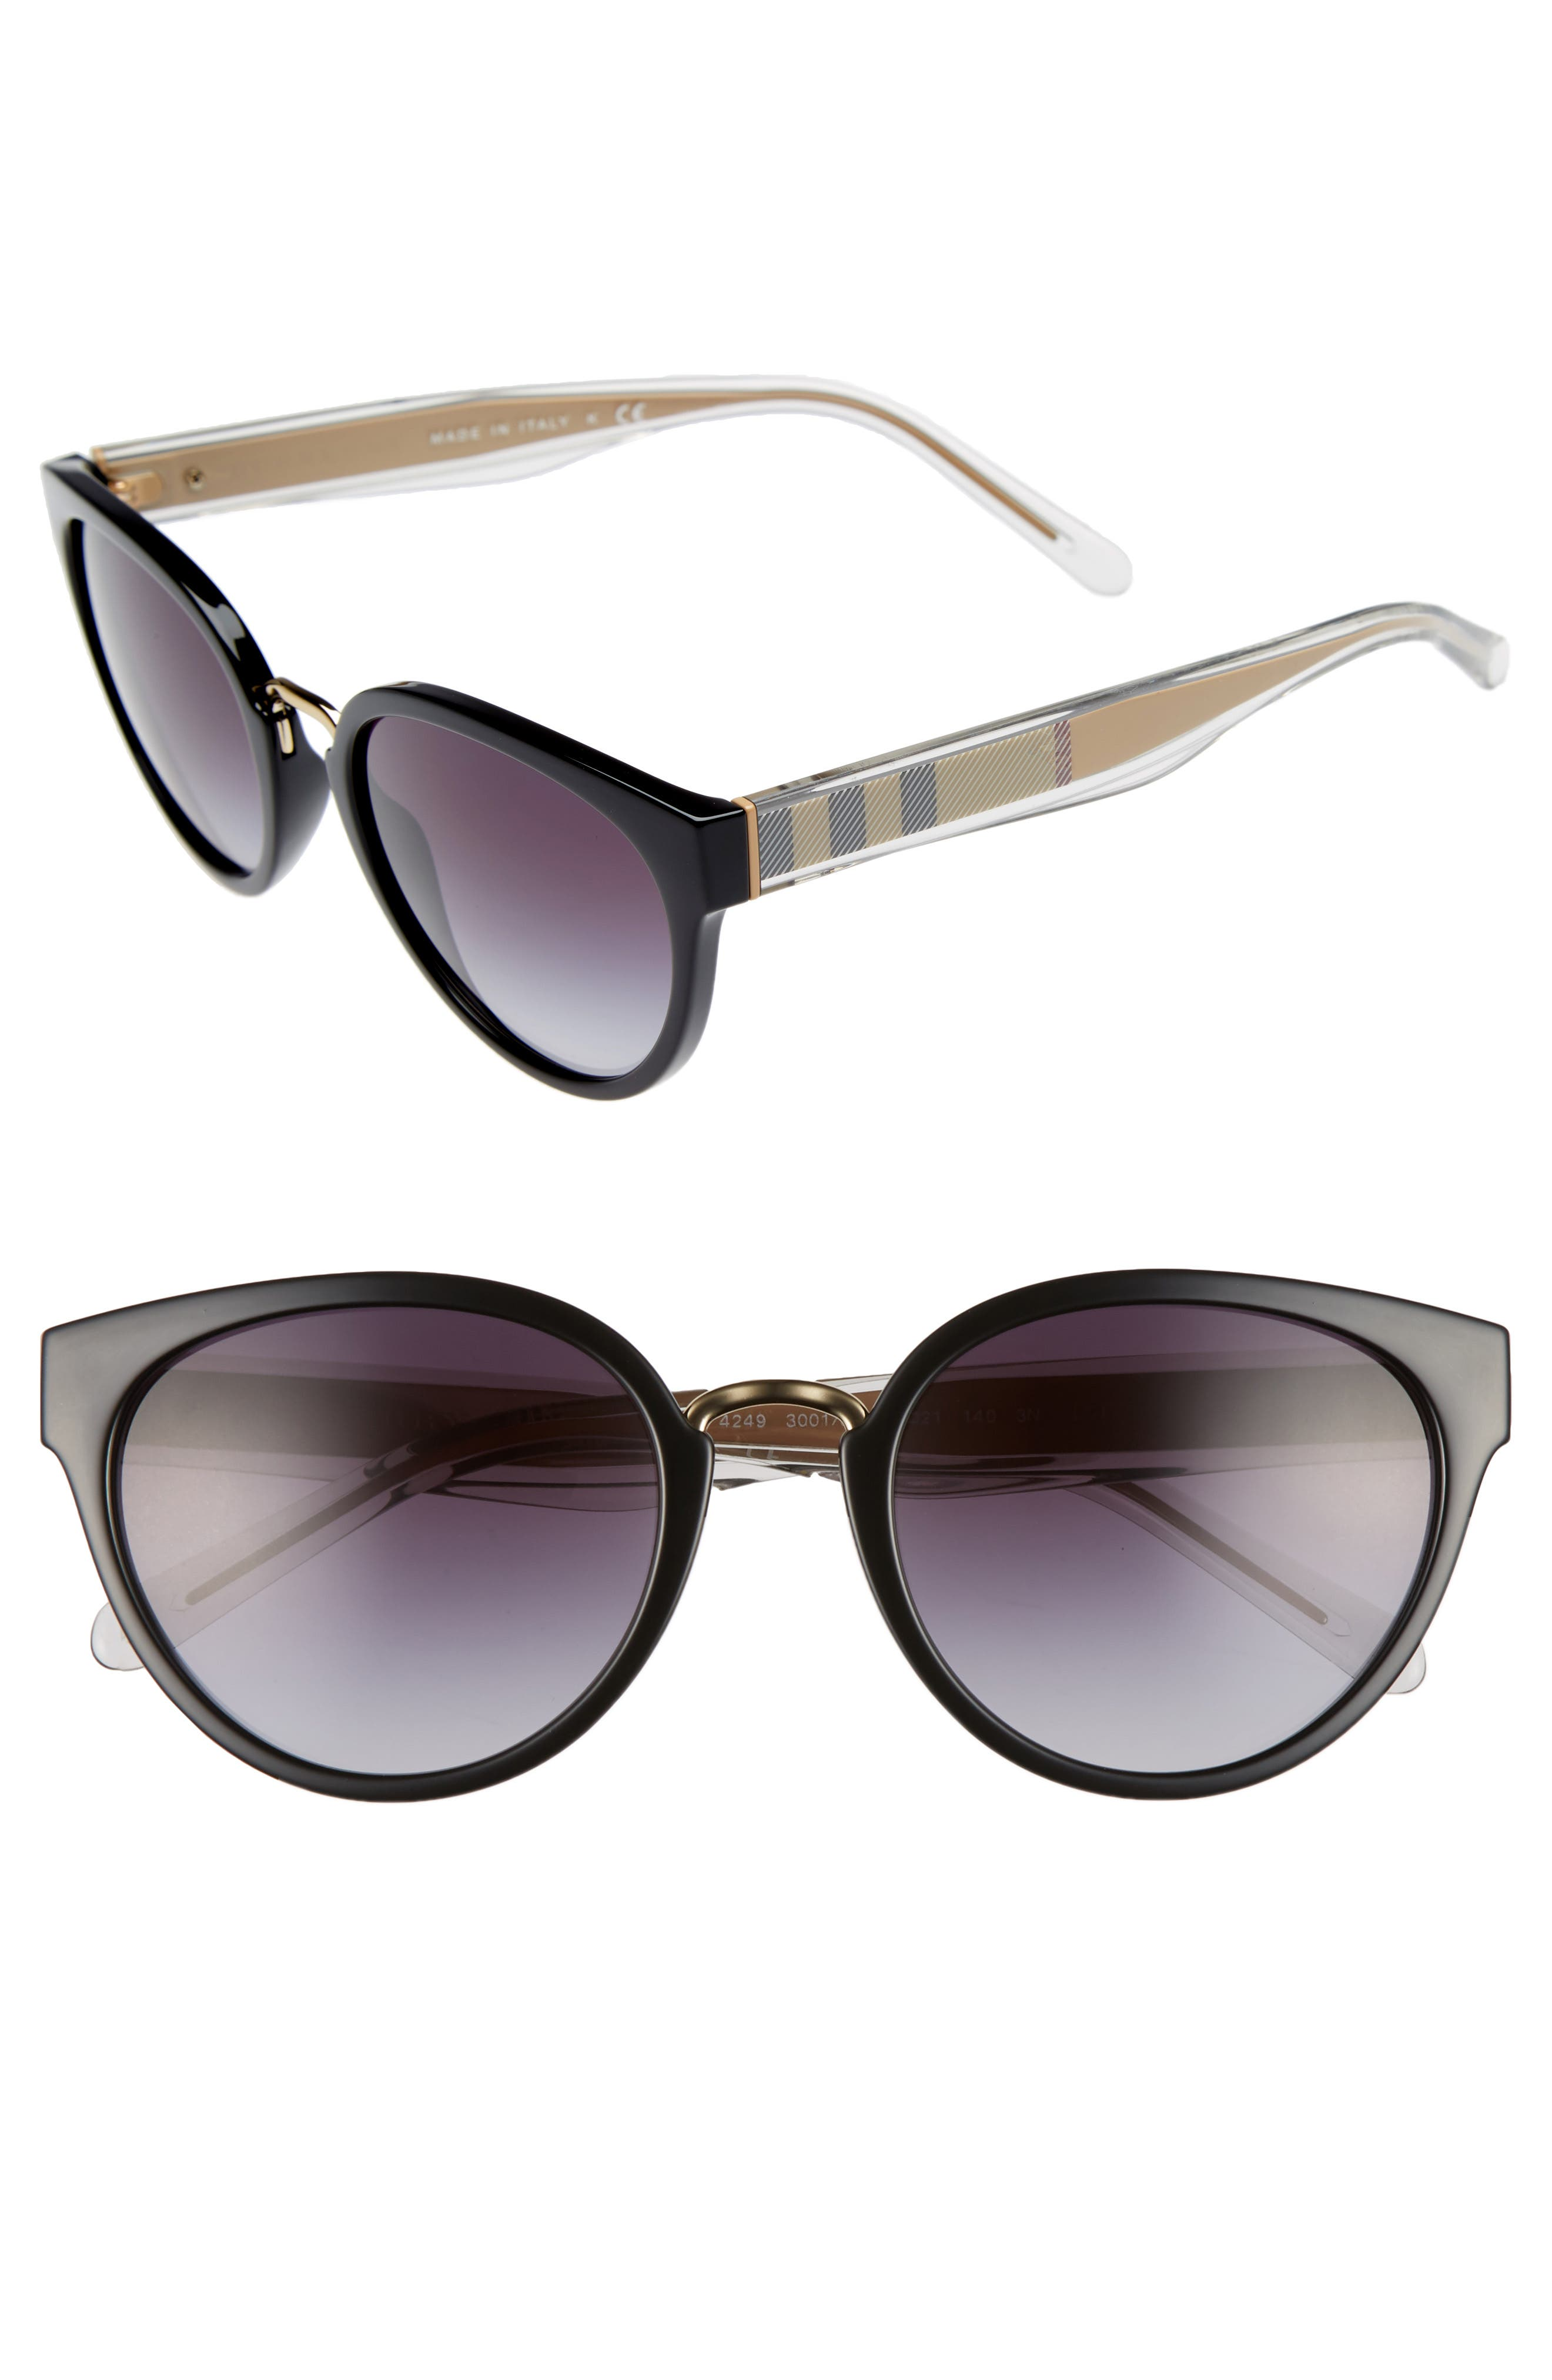 53mm Gradient Cat Eye Sunglasses,                             Main thumbnail 1, color,                             001